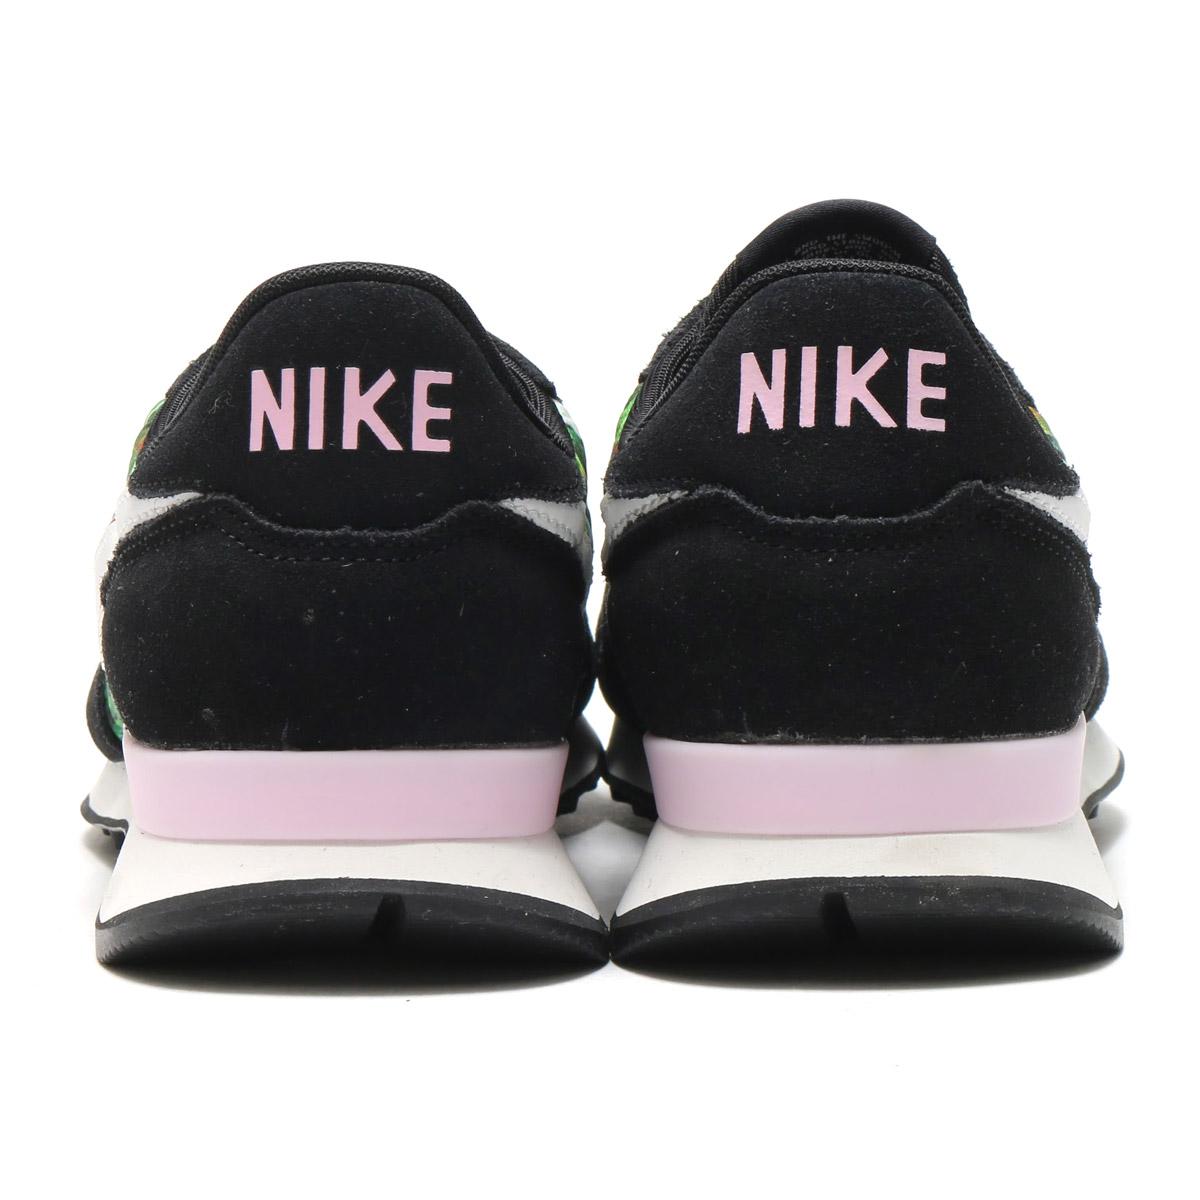 NIKE WMNS INTERNATIONALIST PRM (Nike women internationalist premium) BLACK/SUMMIT WHITE-PRISM PINK 17SU-I